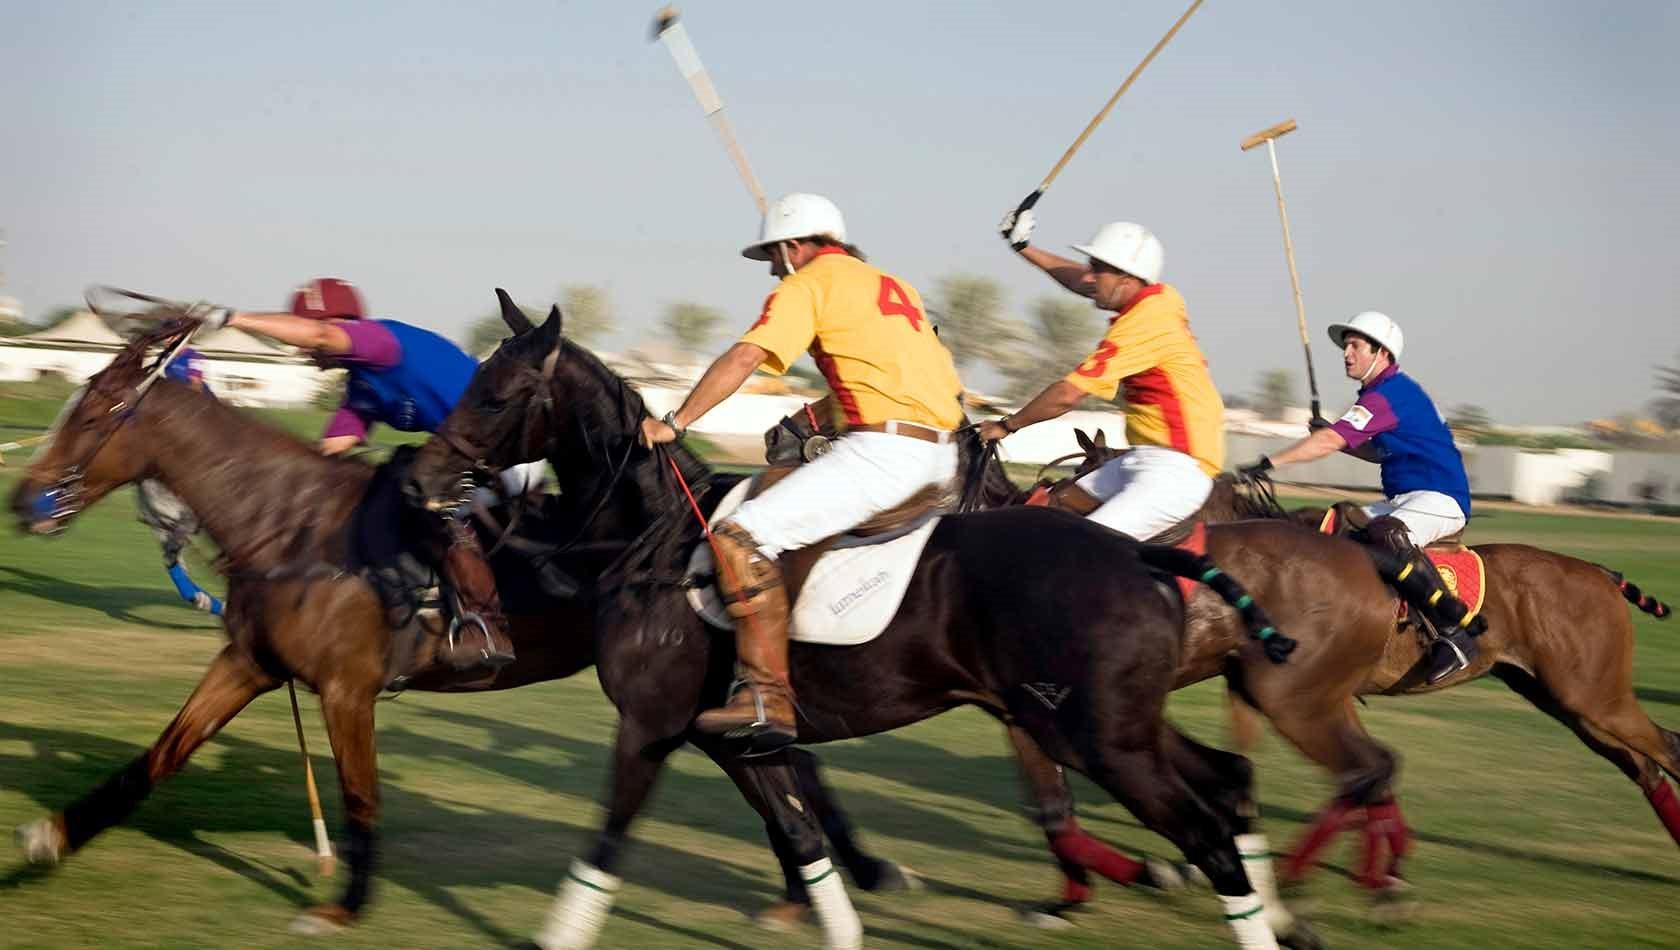 Polo kongernes sport